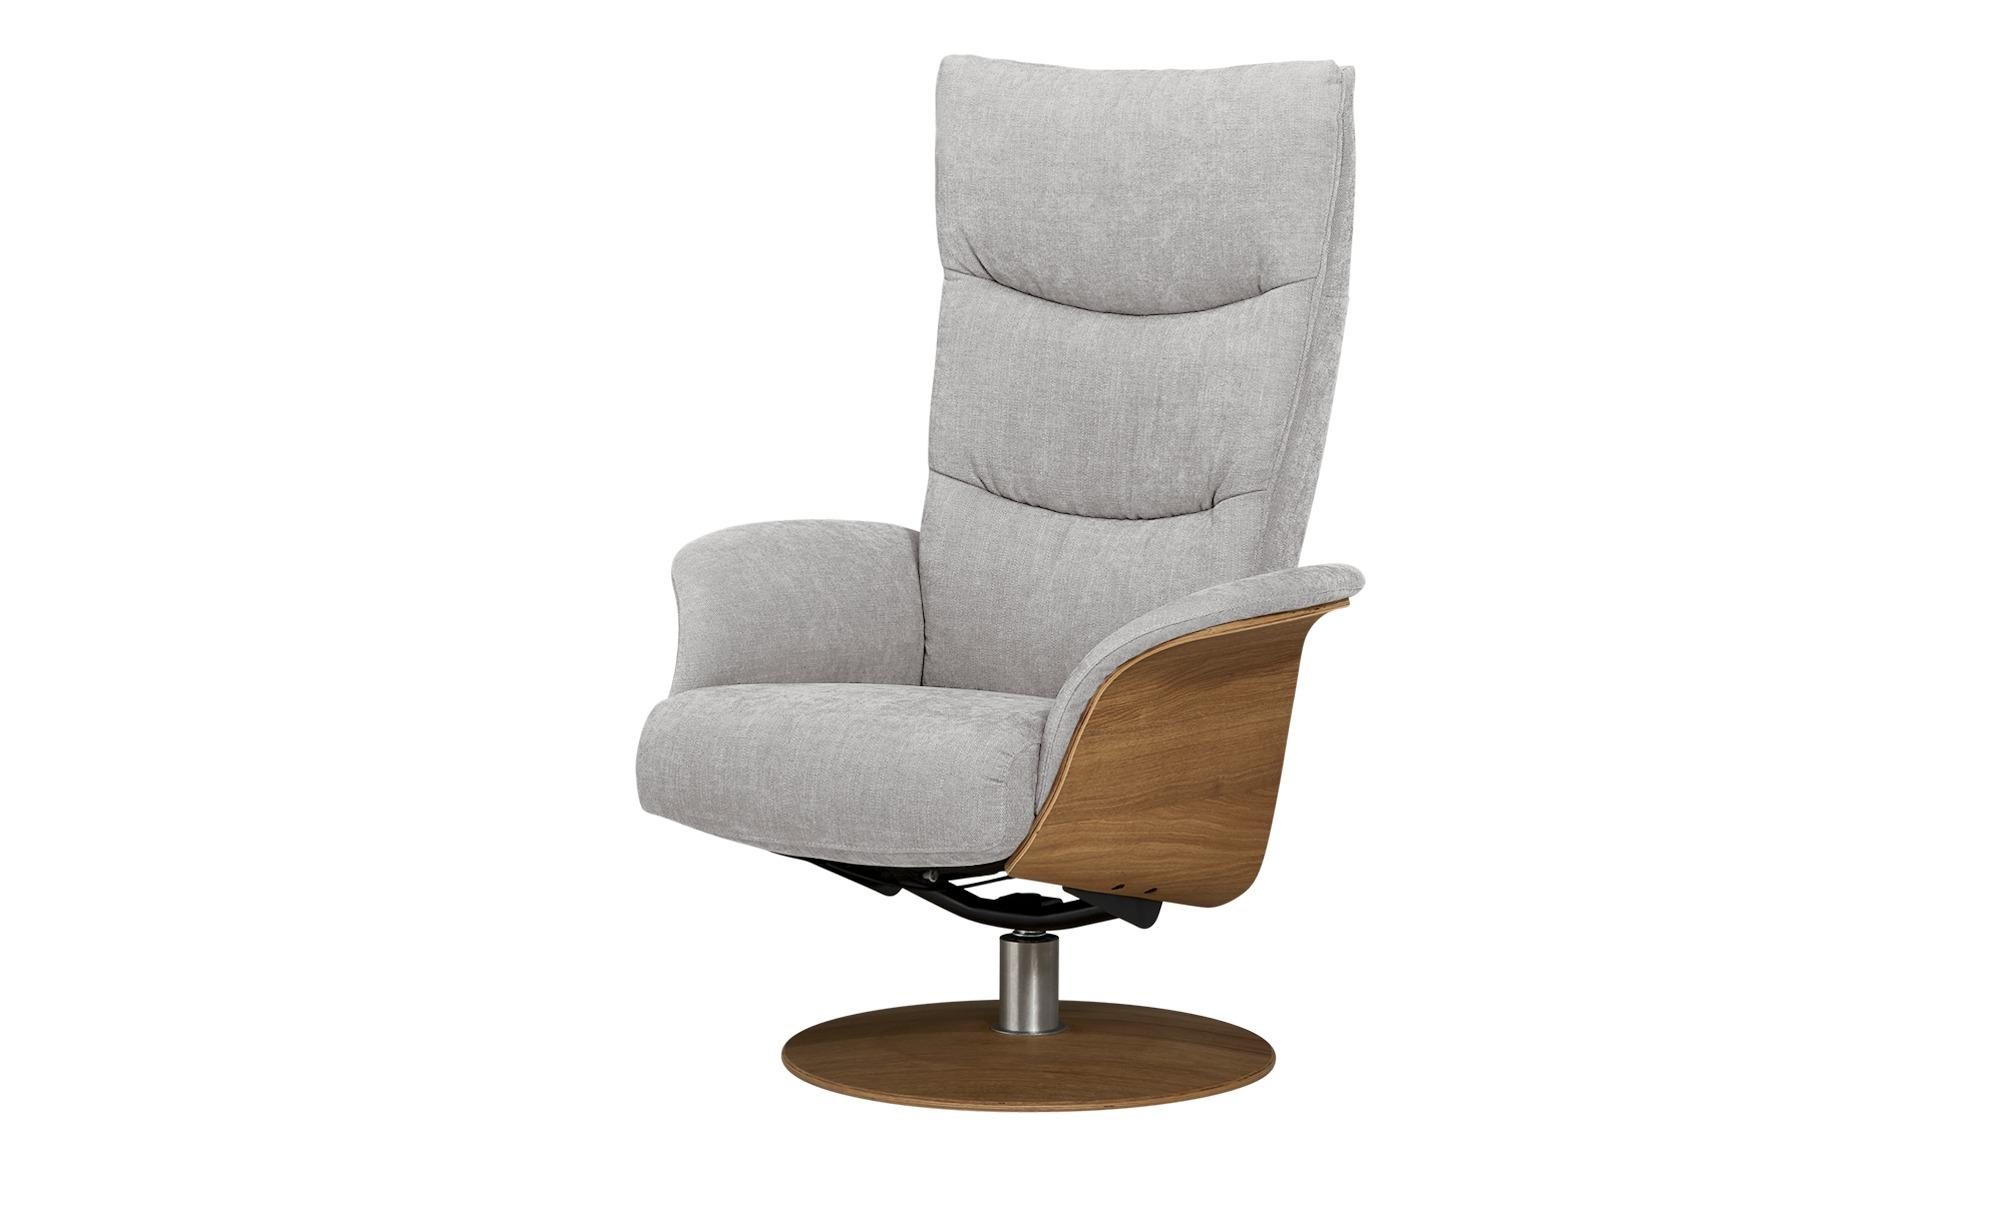 Nils Olsen Relaxsessel  Stian ¦ creme ¦ Maße (cm): B: 77 H: 116 T: 82 Polstermöbel > Sessel > Fernsehsessel - Höffner